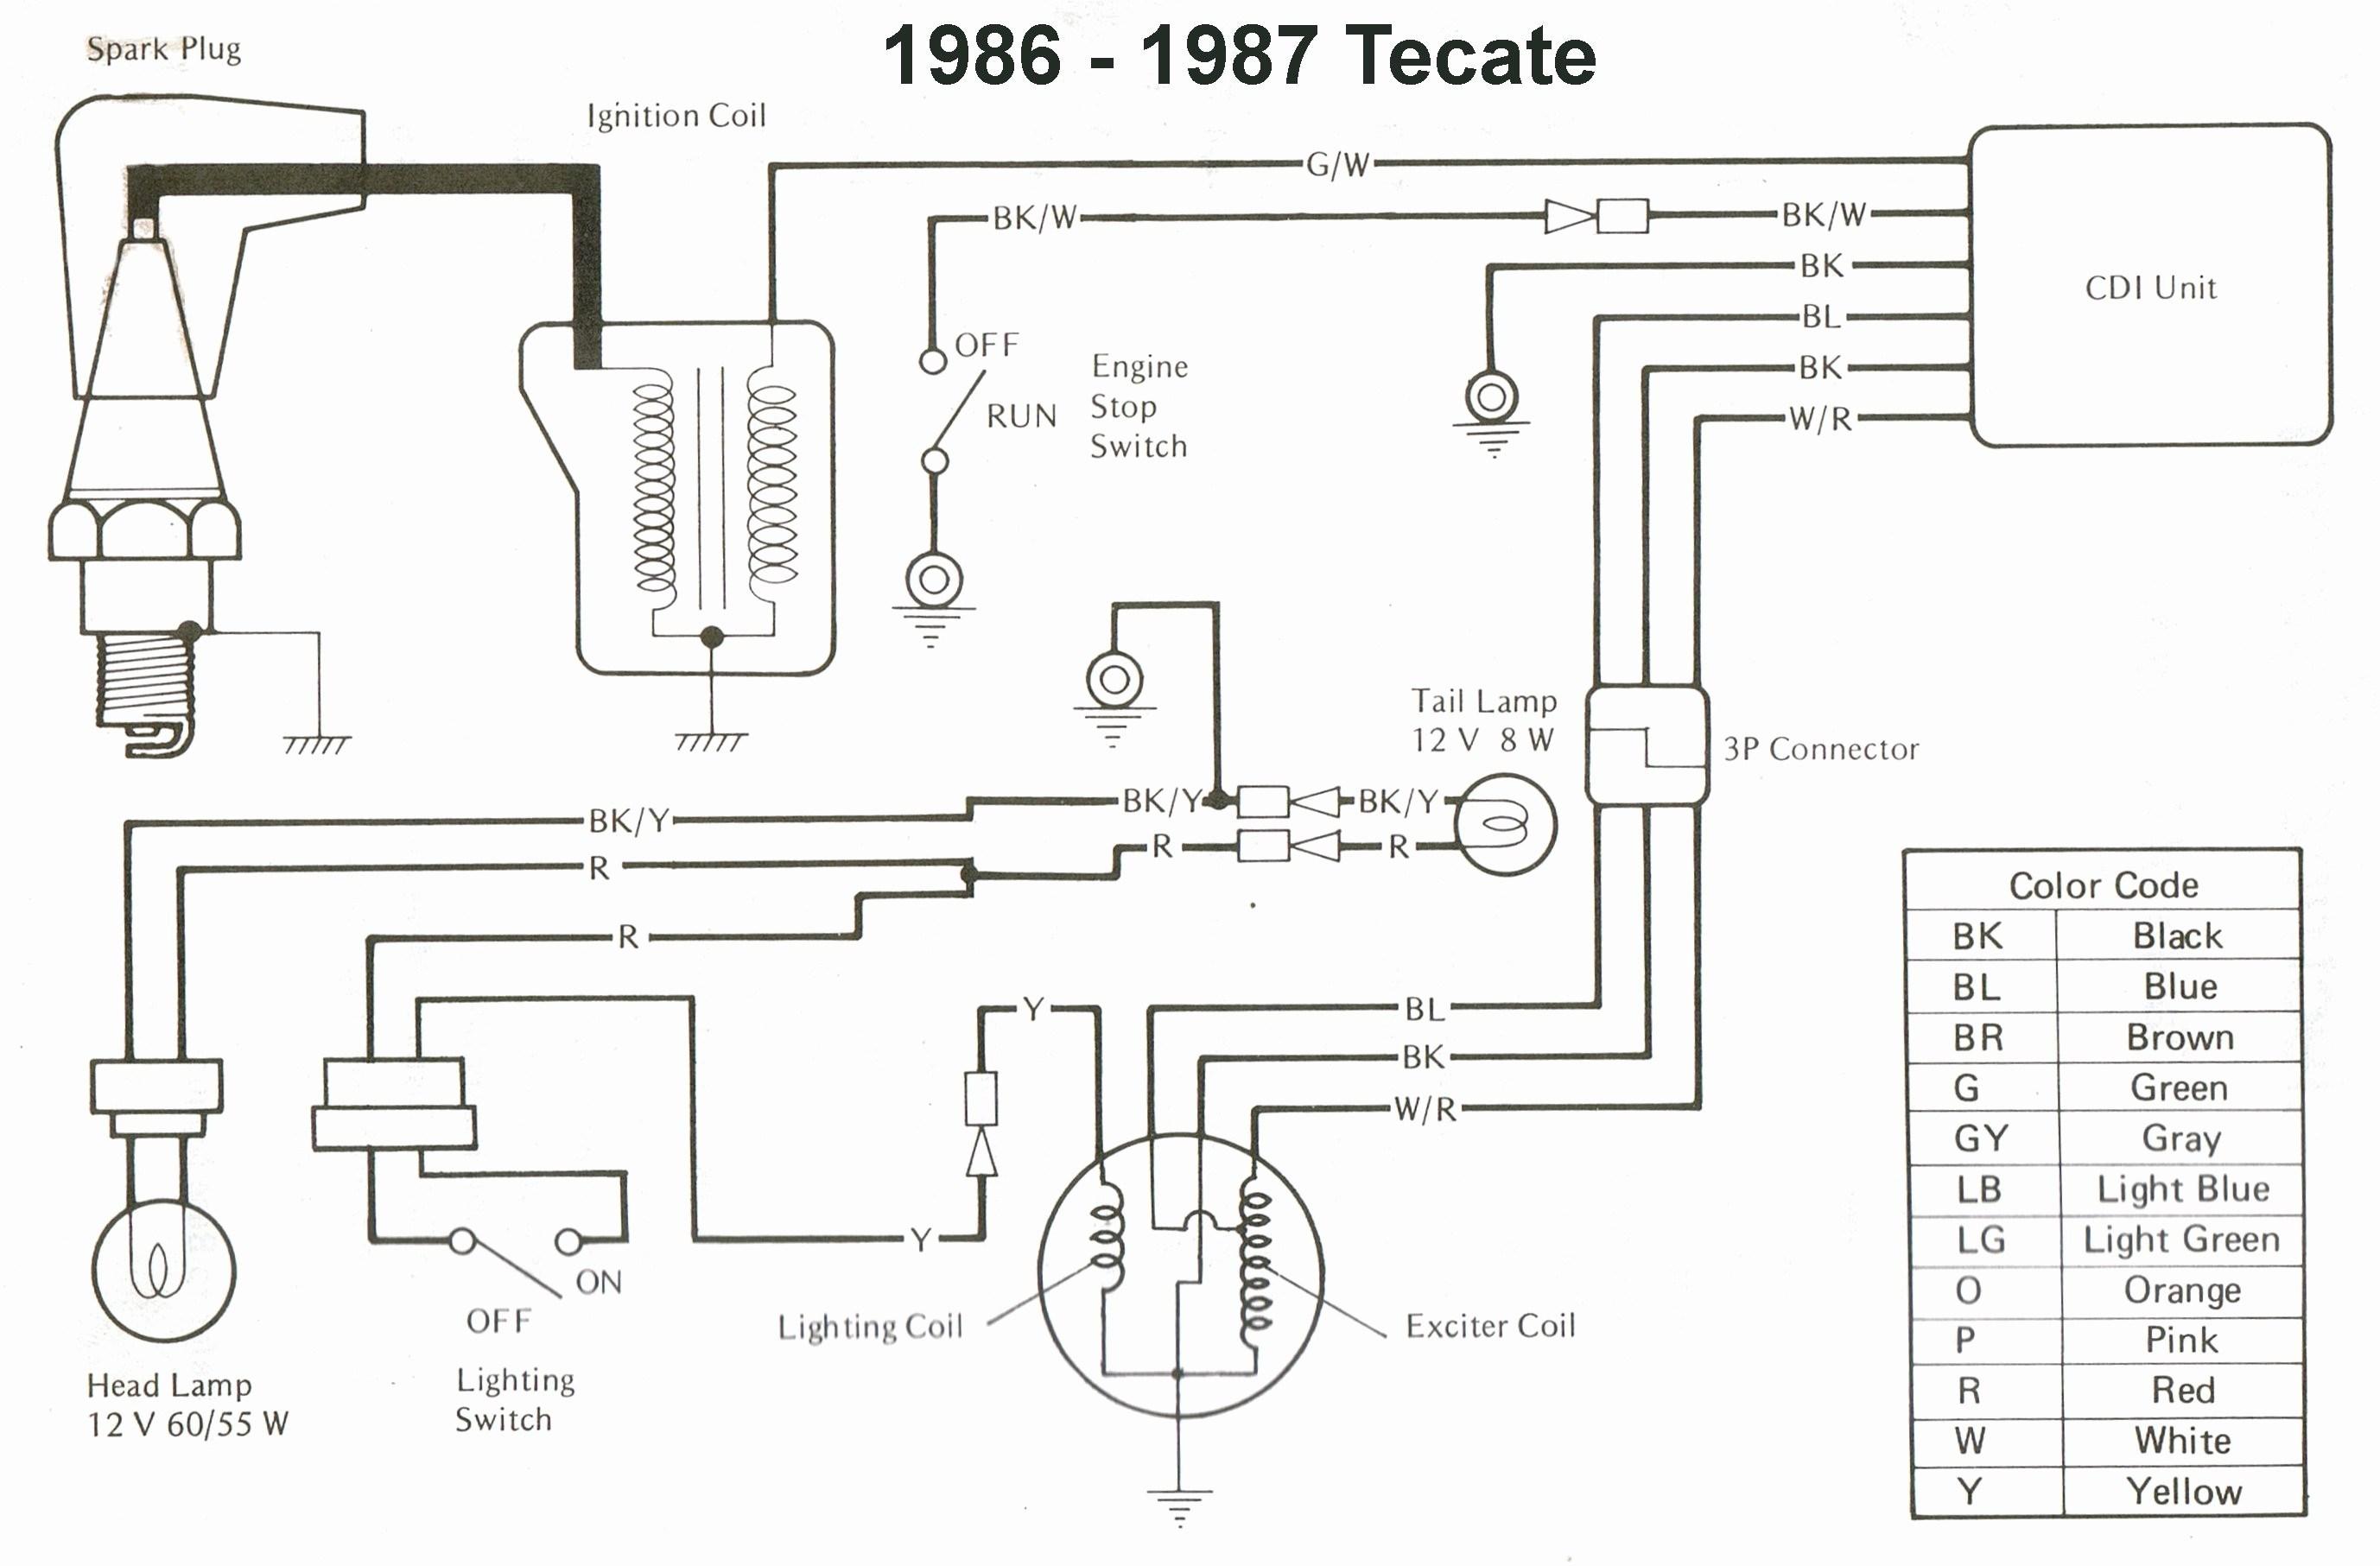 WF_6707] Bayou 300 Carburetor Diagram As Well Kawasaki Bayou 300 Wiring  Diagram Download DiagramTacle Xolia Mohammedshrine Librar Wiring 101